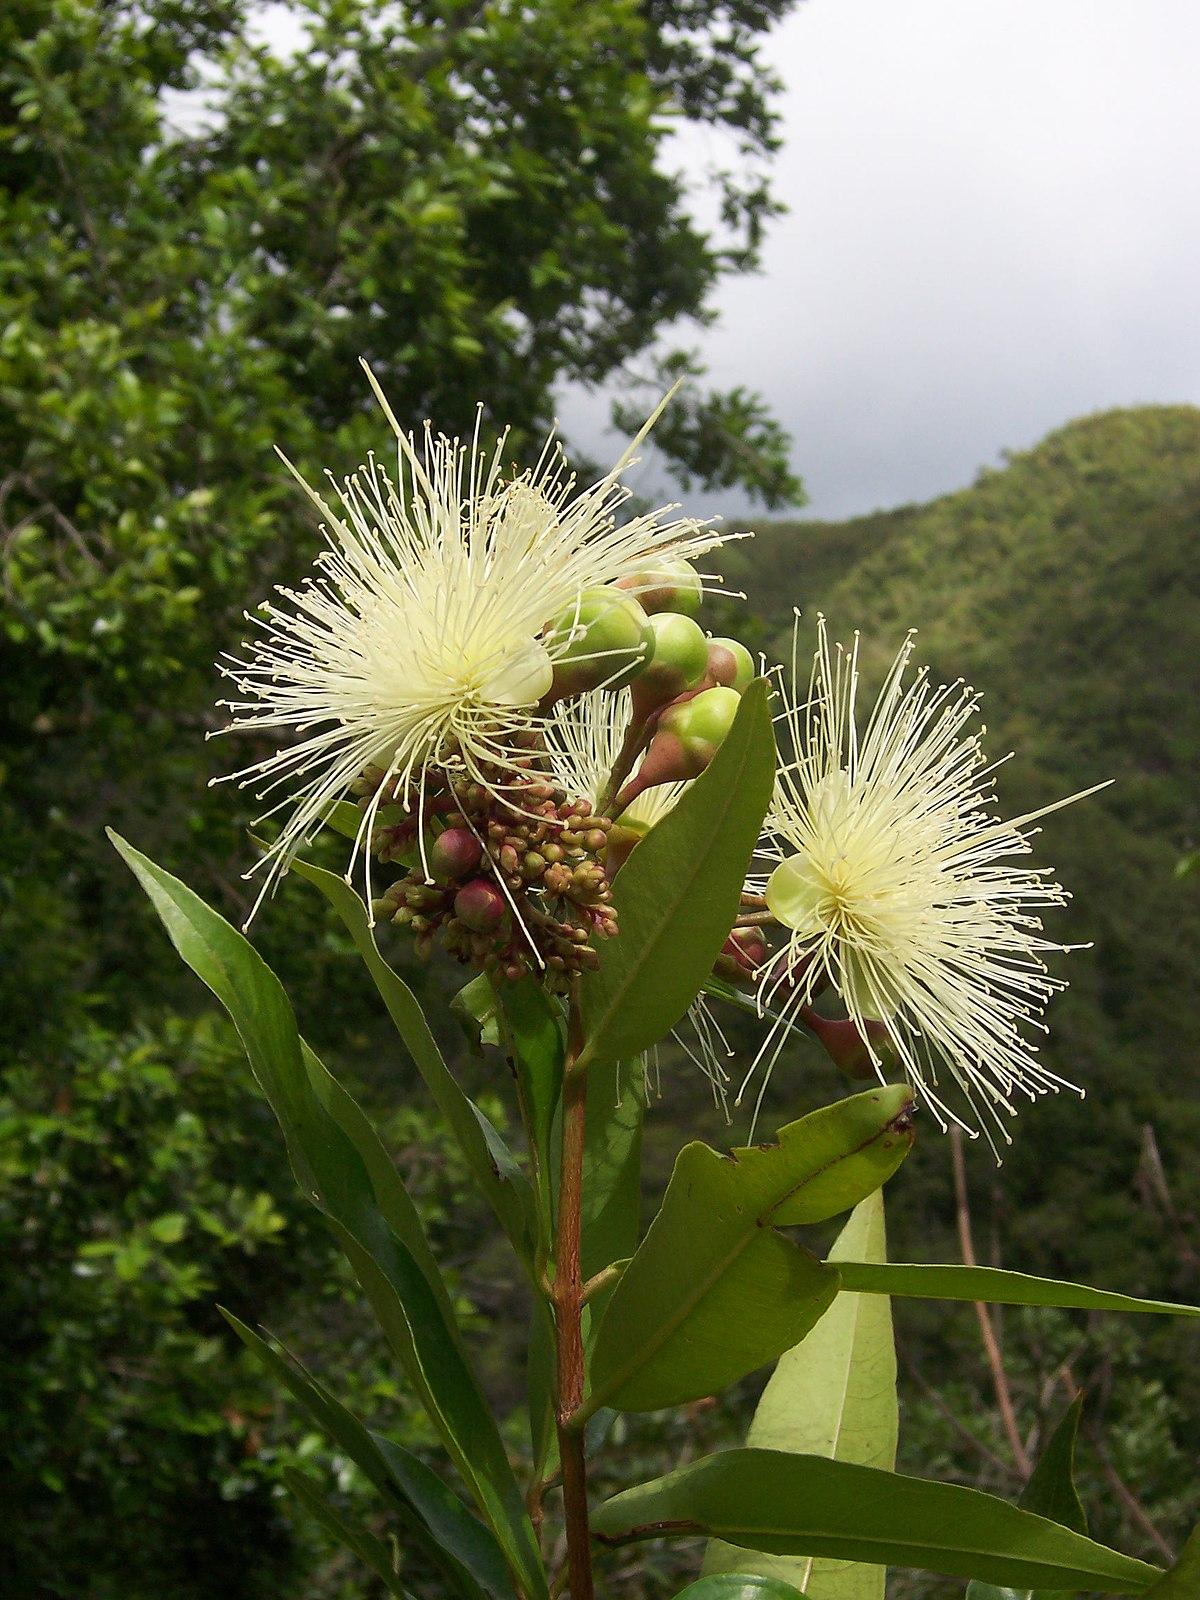 Syzygium jambos - Wikipedia